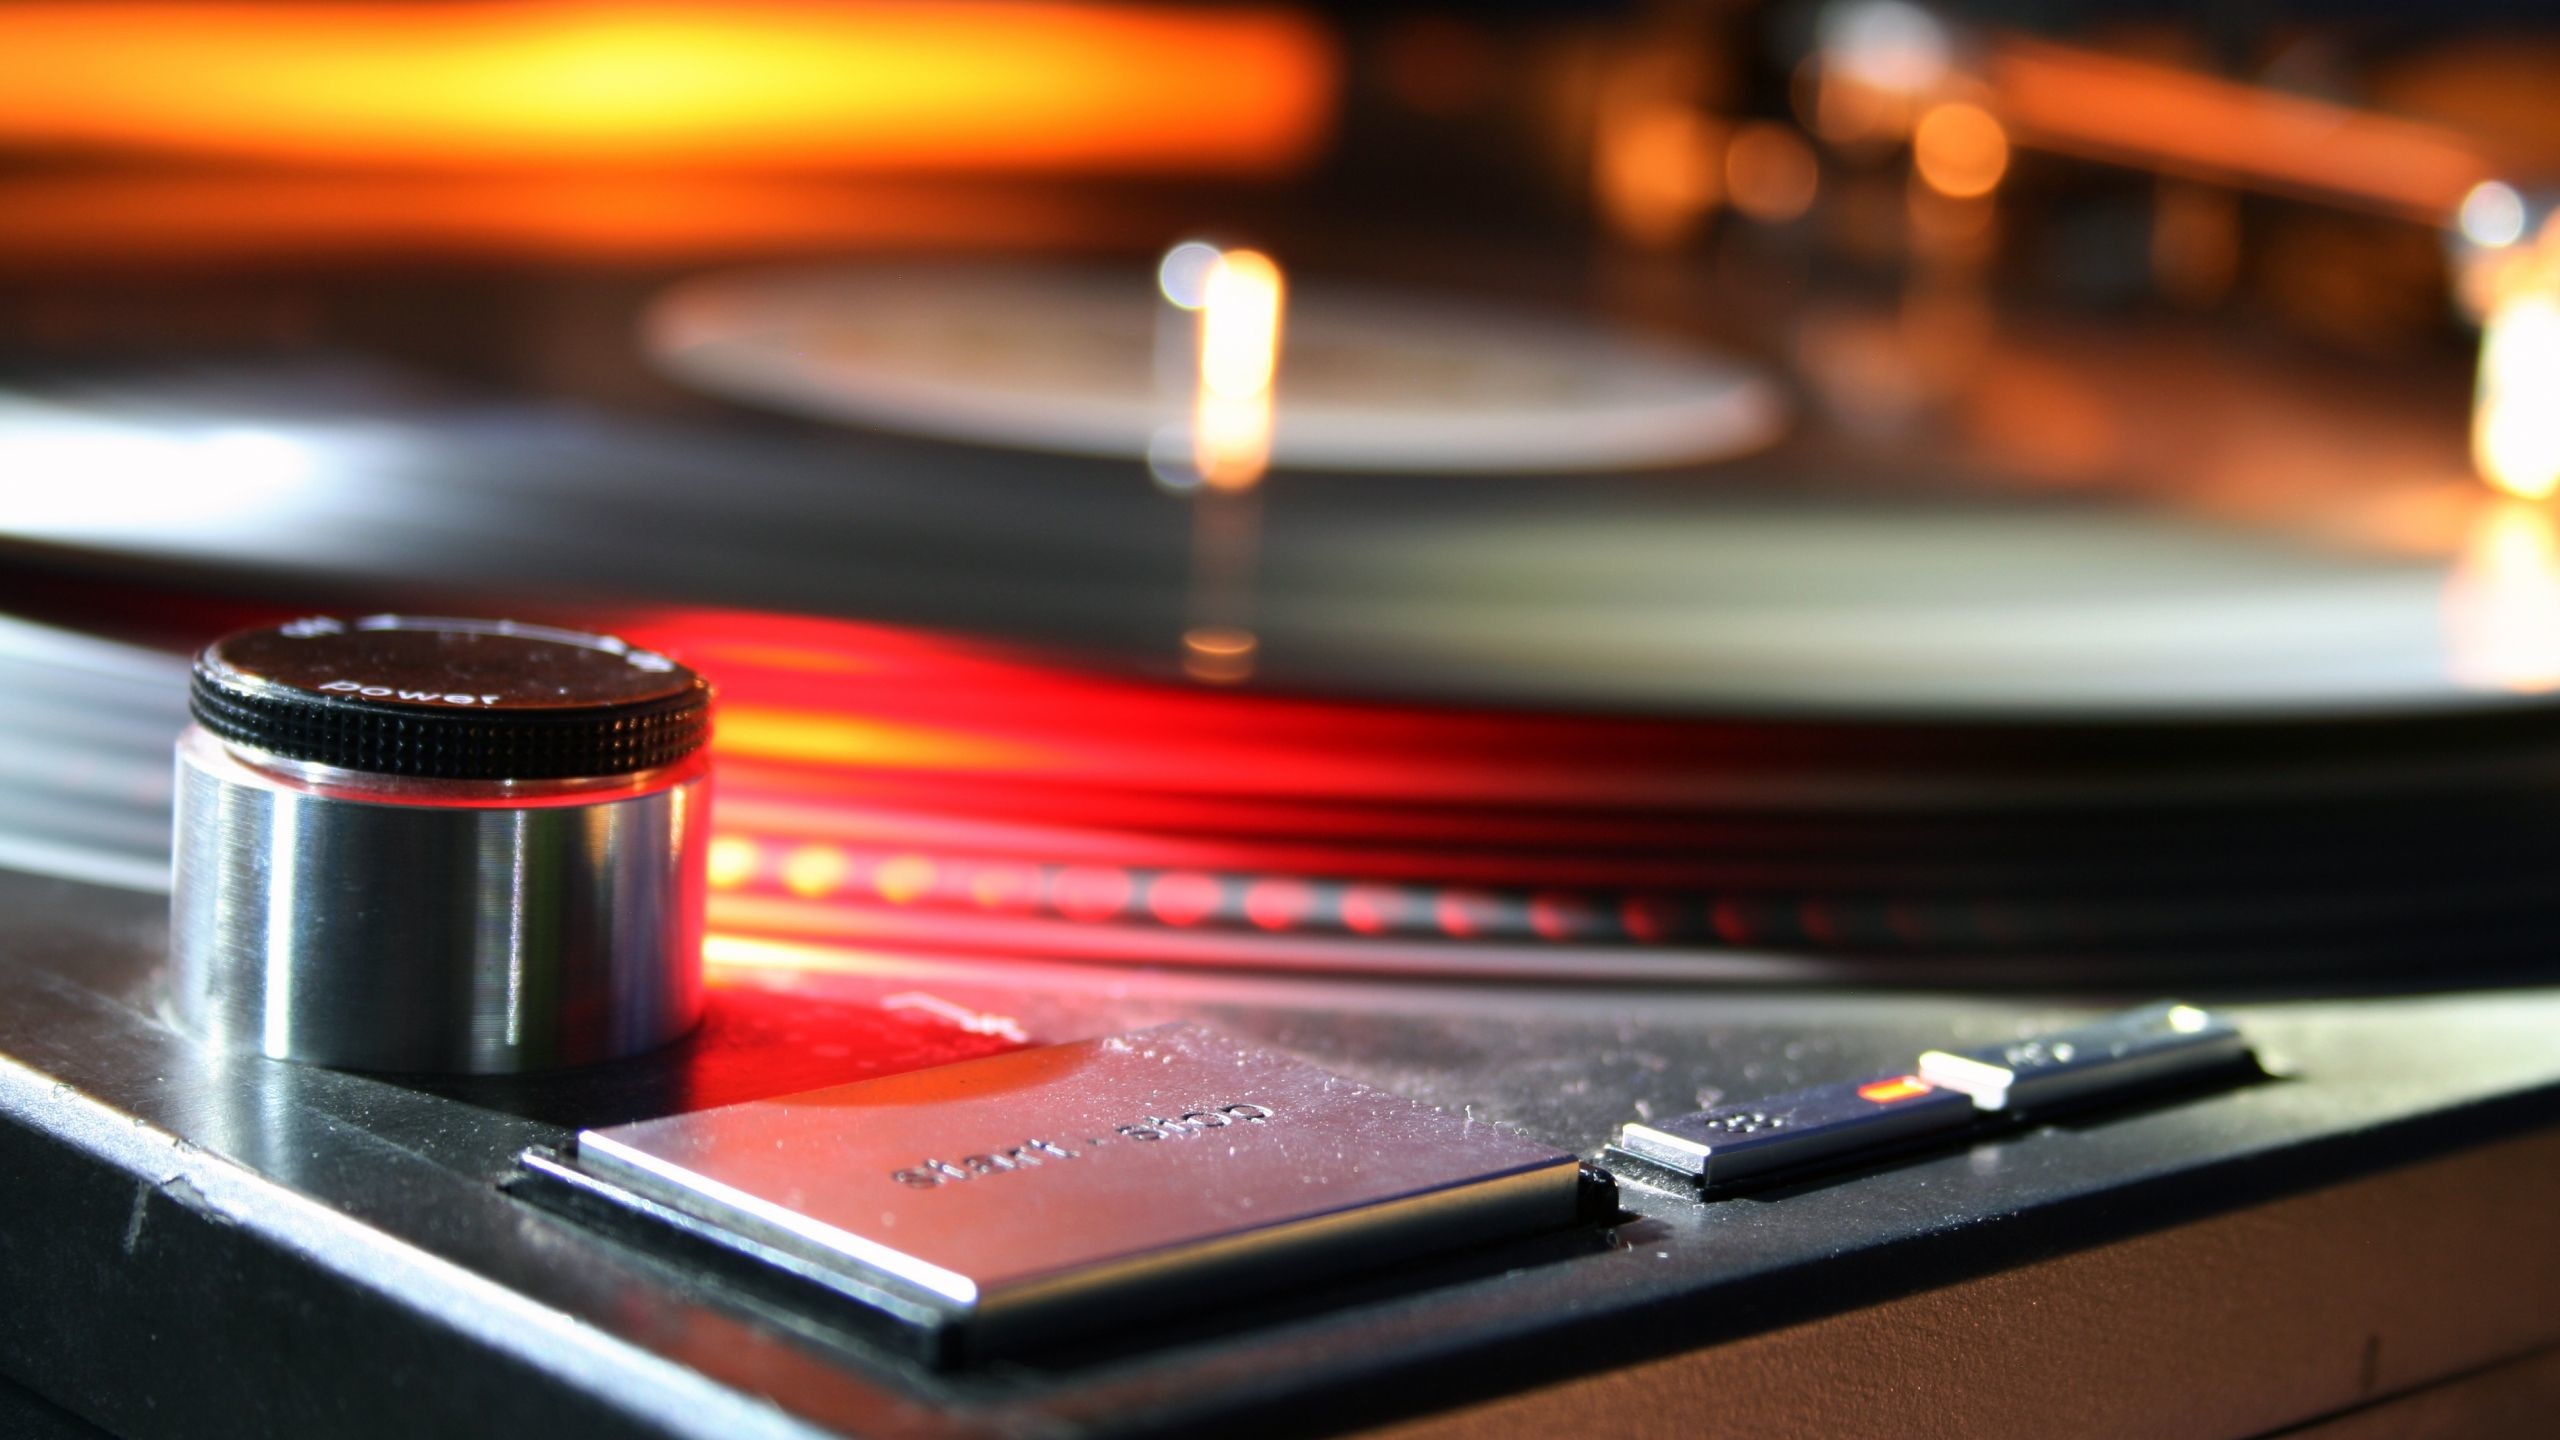 Res: 2560x1440, DJ Turntable Wallpaper